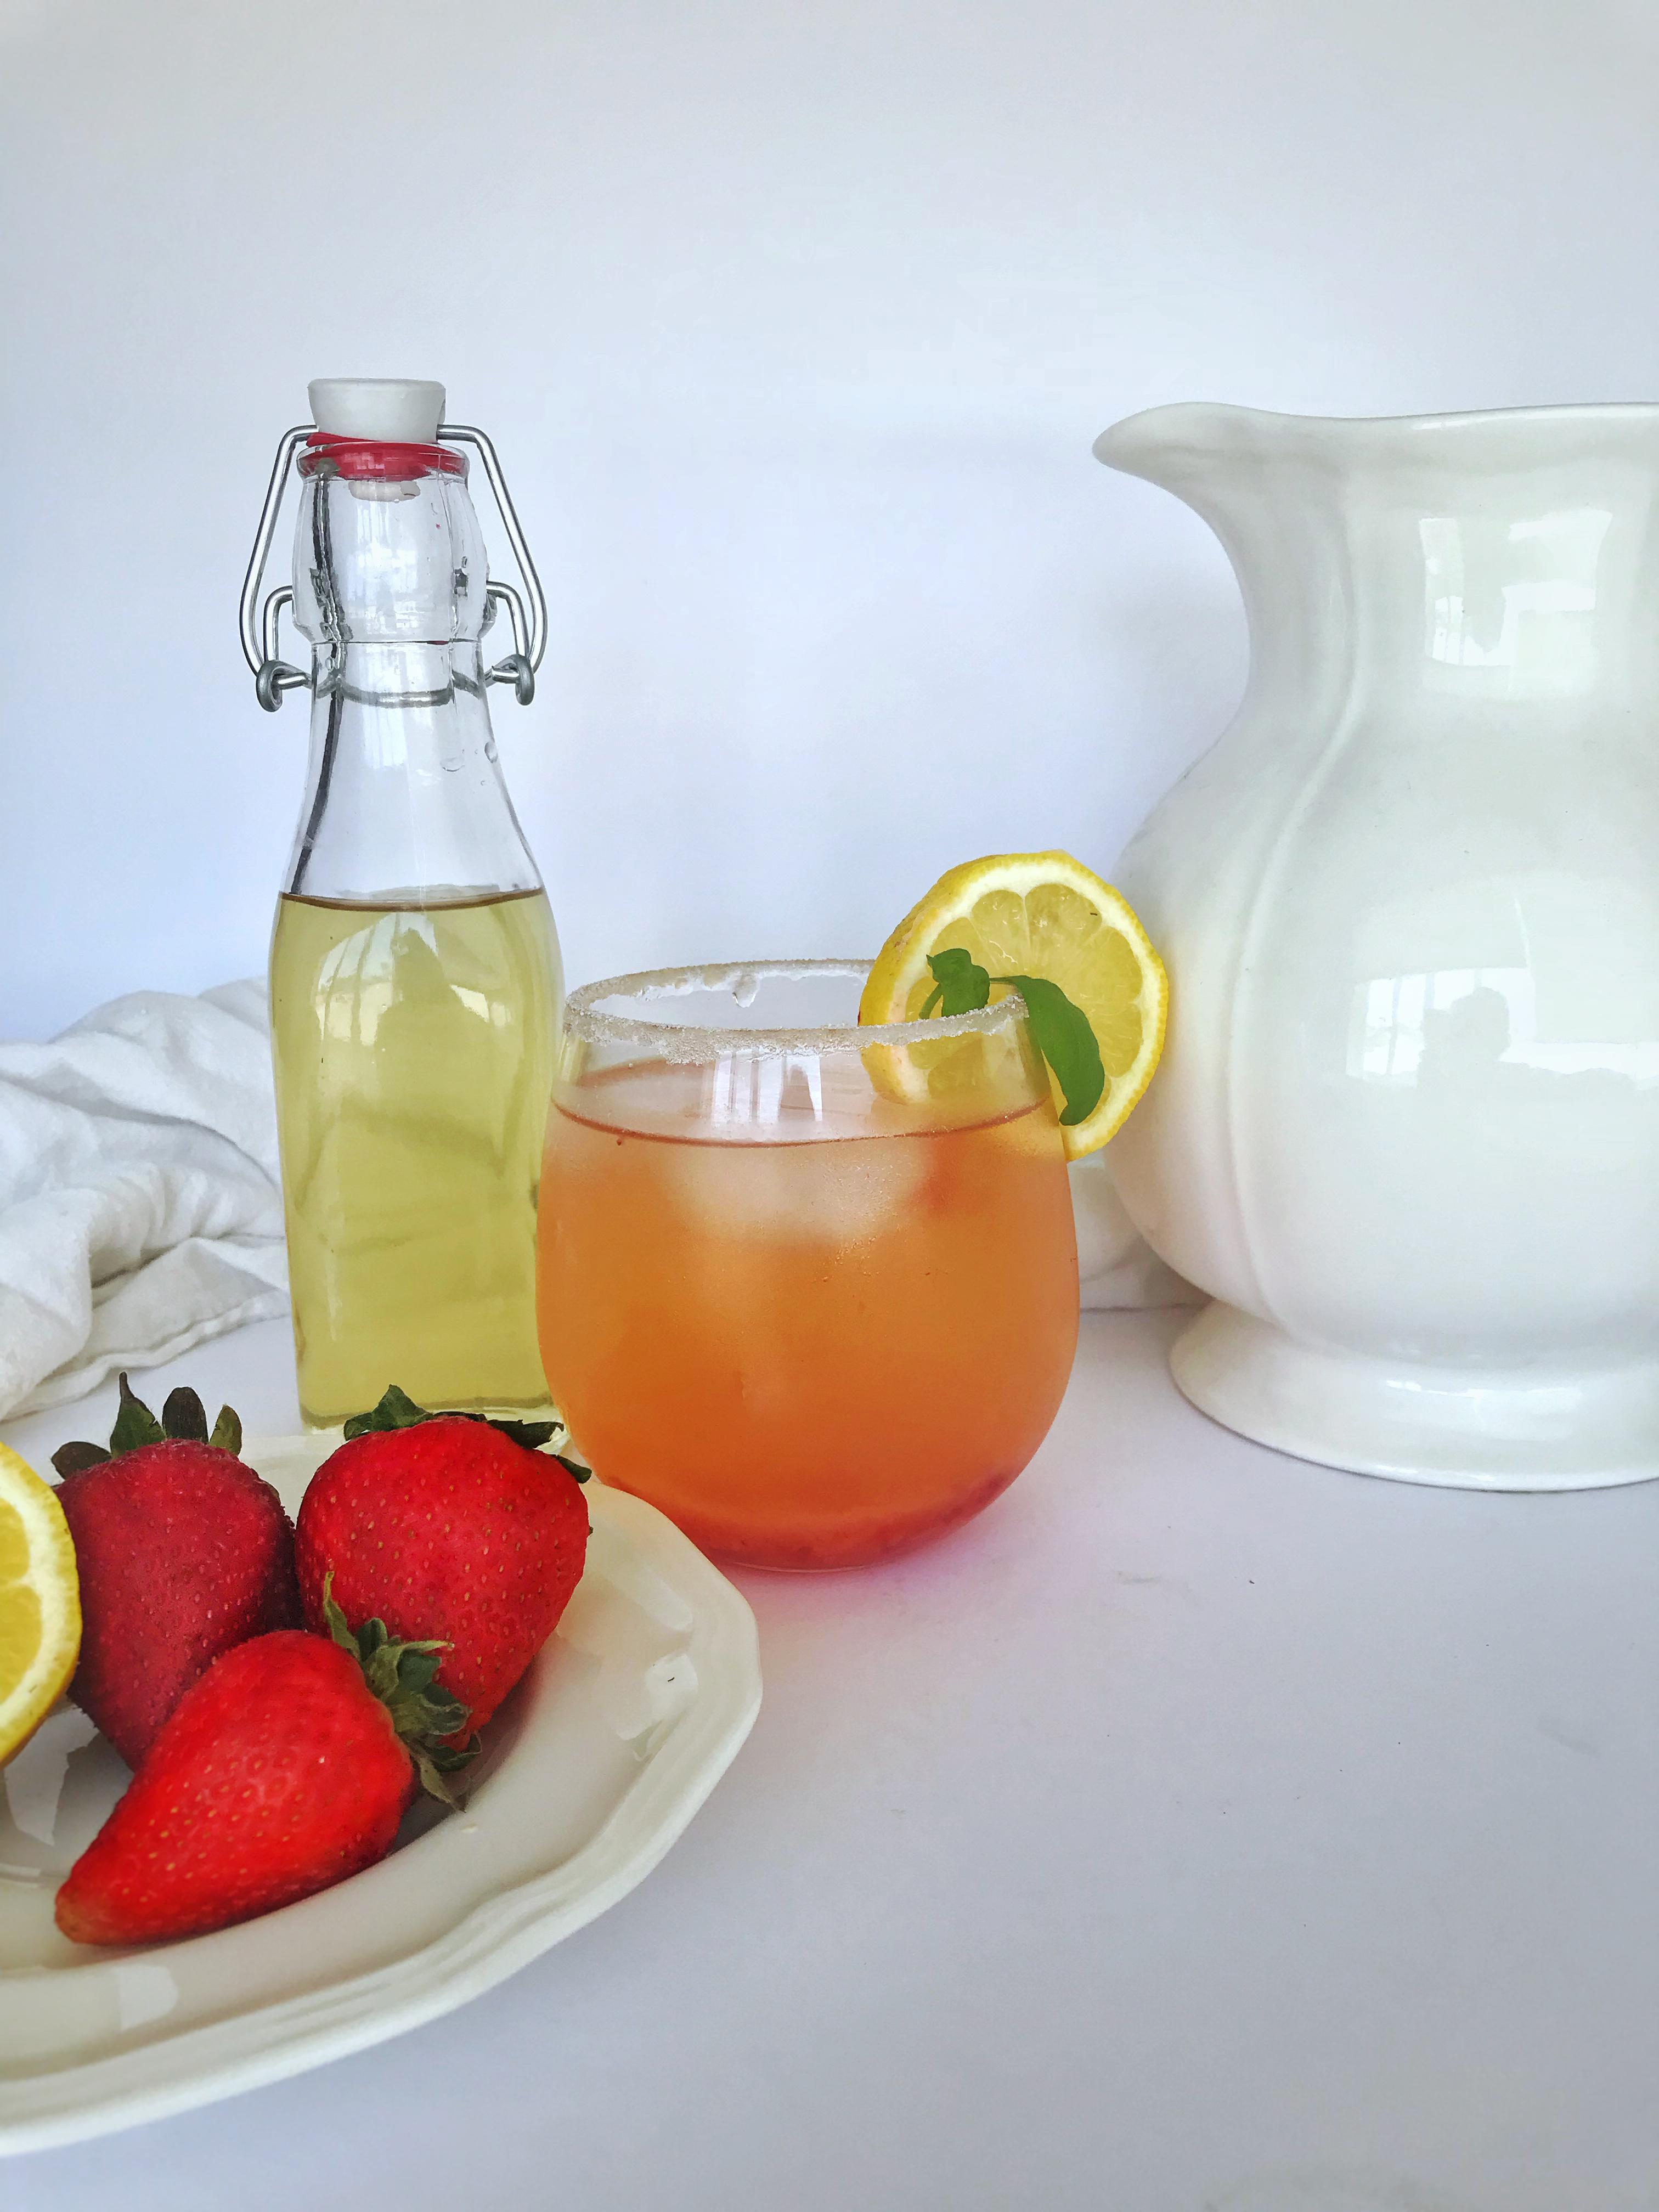 basil simple syrup and strawberry basil lemonade